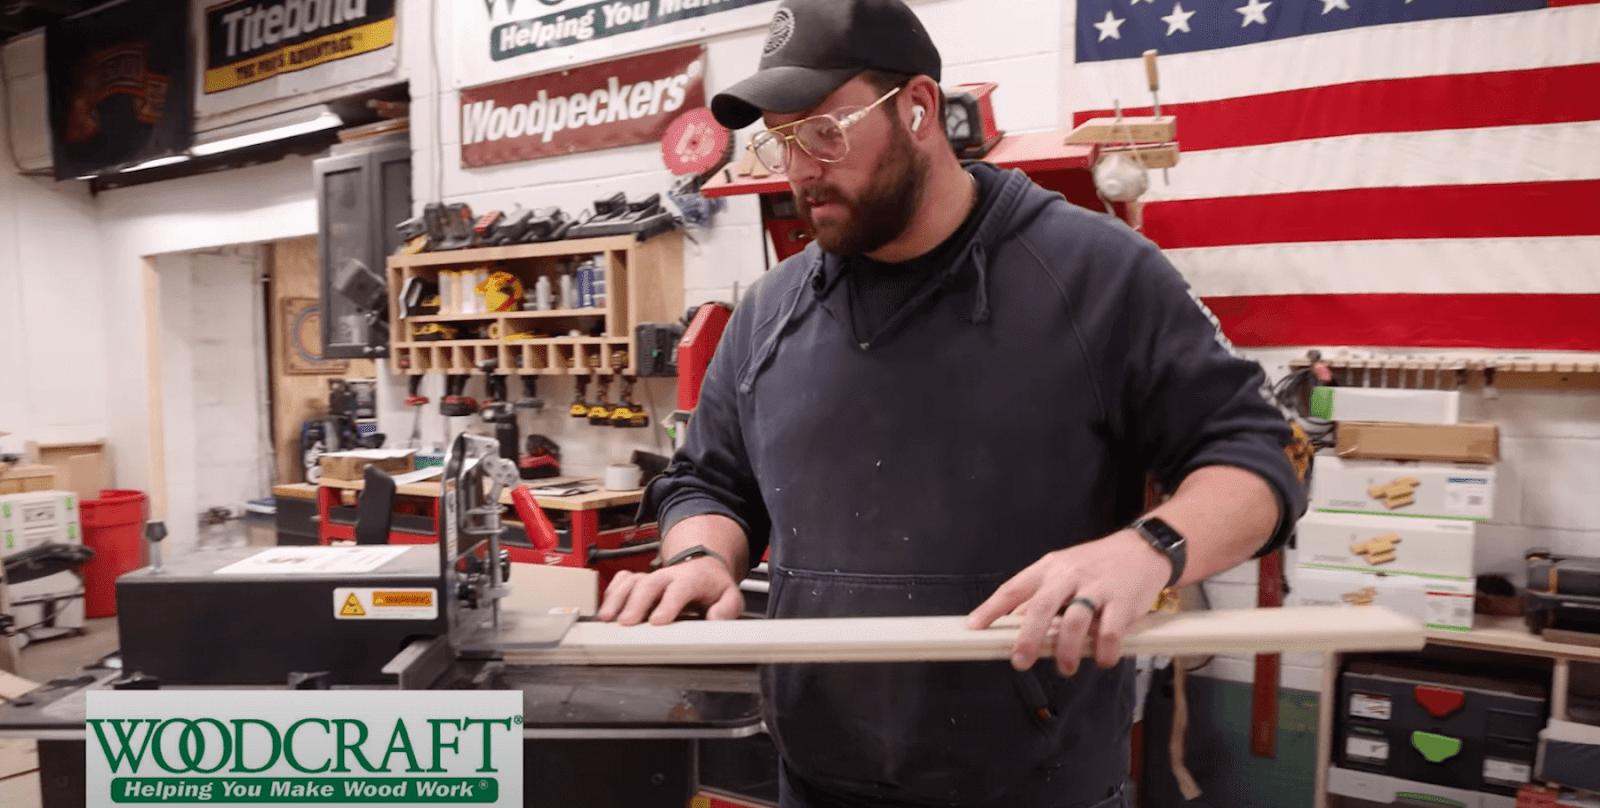 John Malecki cutting wood